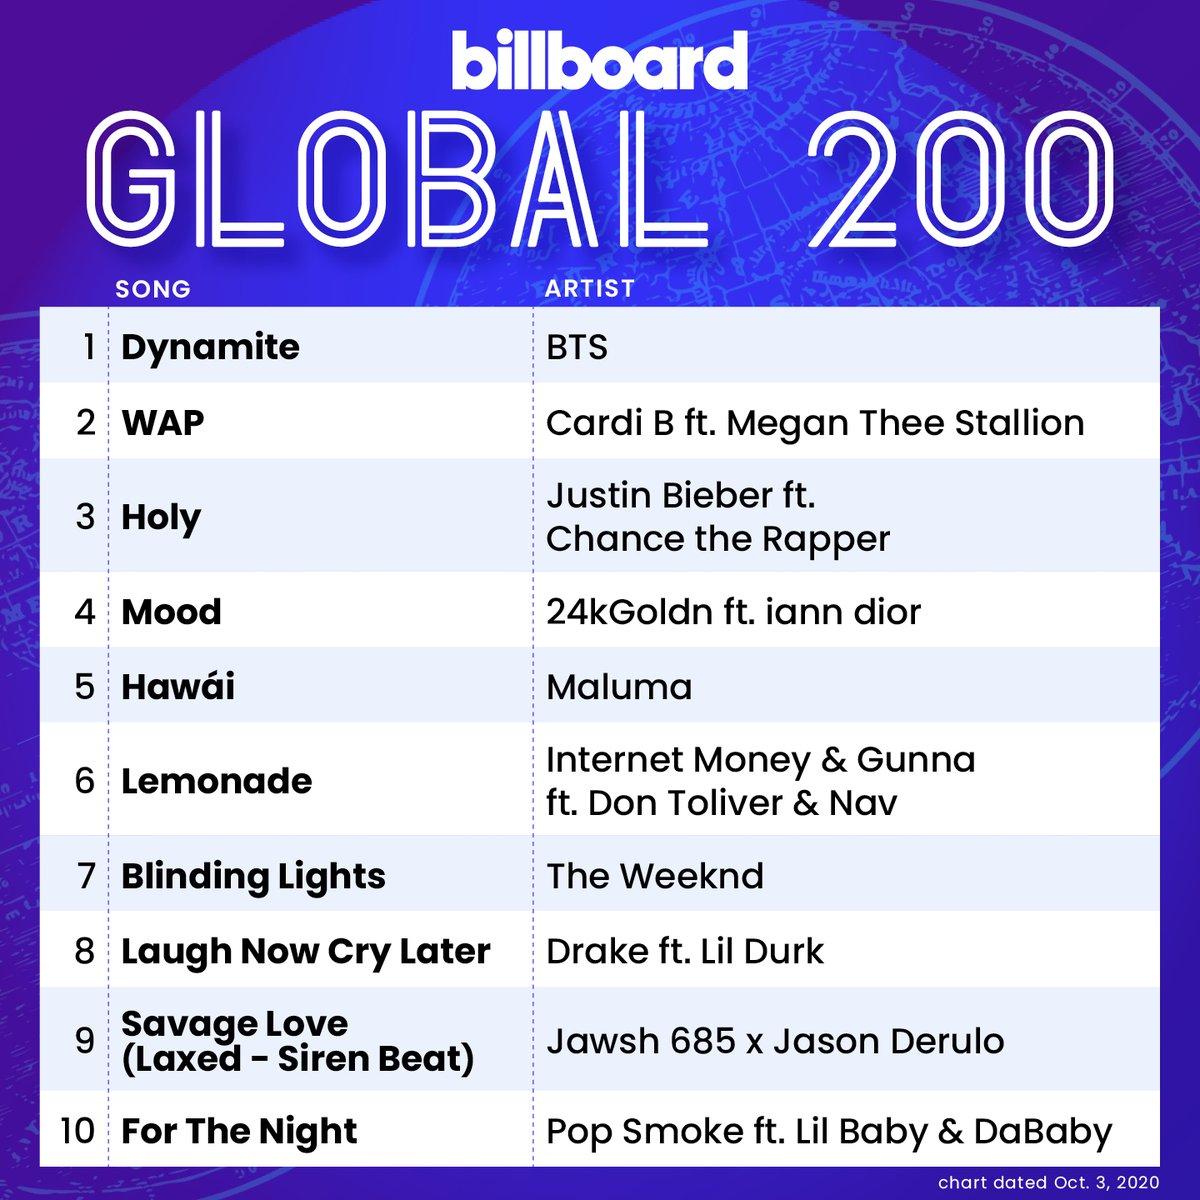 The #BillboardGlobal200 top 10 (chart dated Oct. 3, 2020) https://t.co/BibCMNUGZj